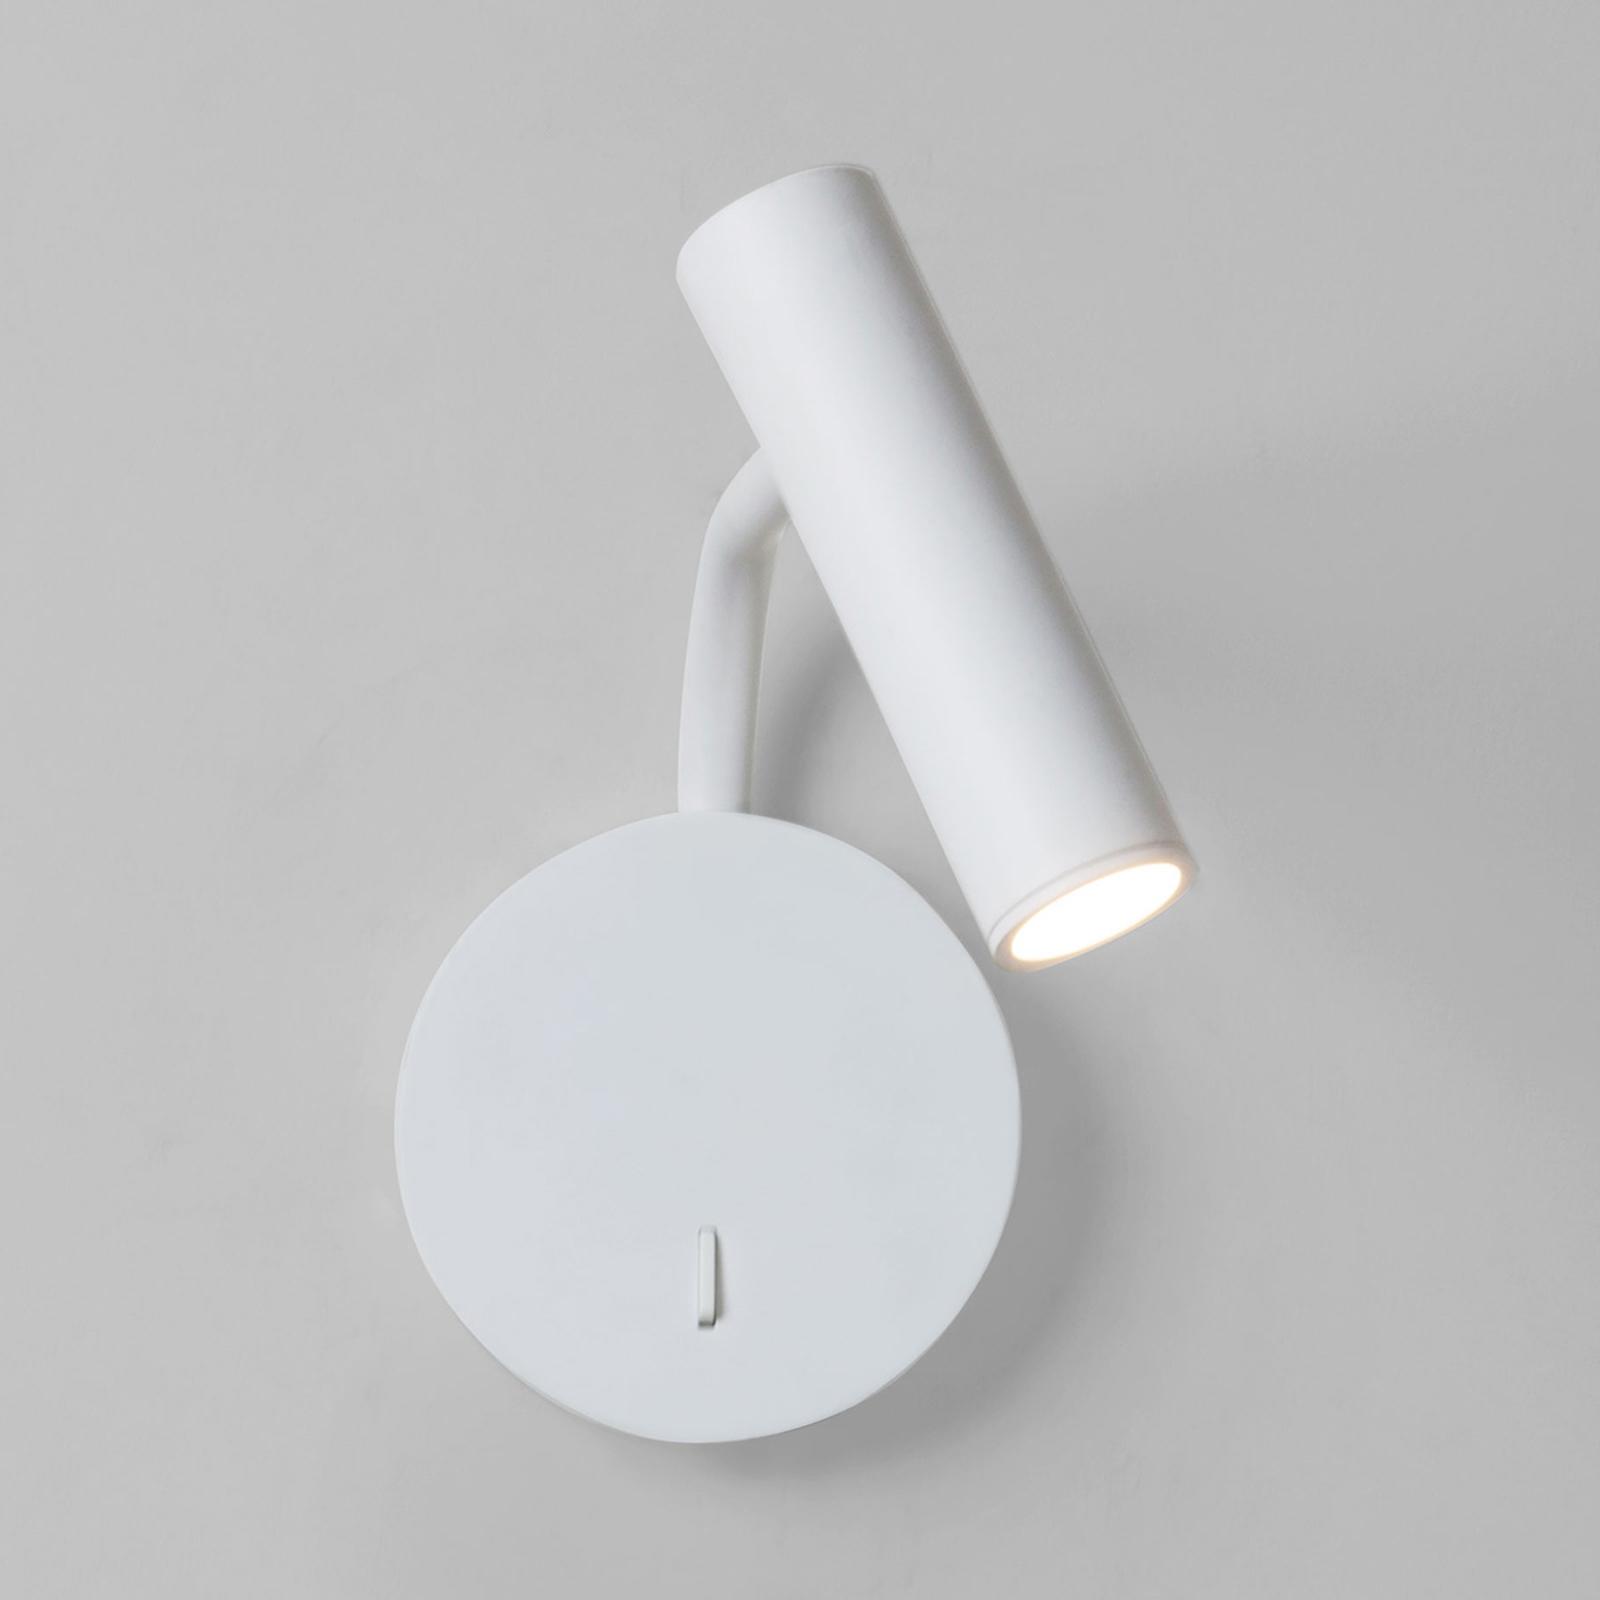 Astro Enna Wall LED nástěnné světlo, otočné, bílá